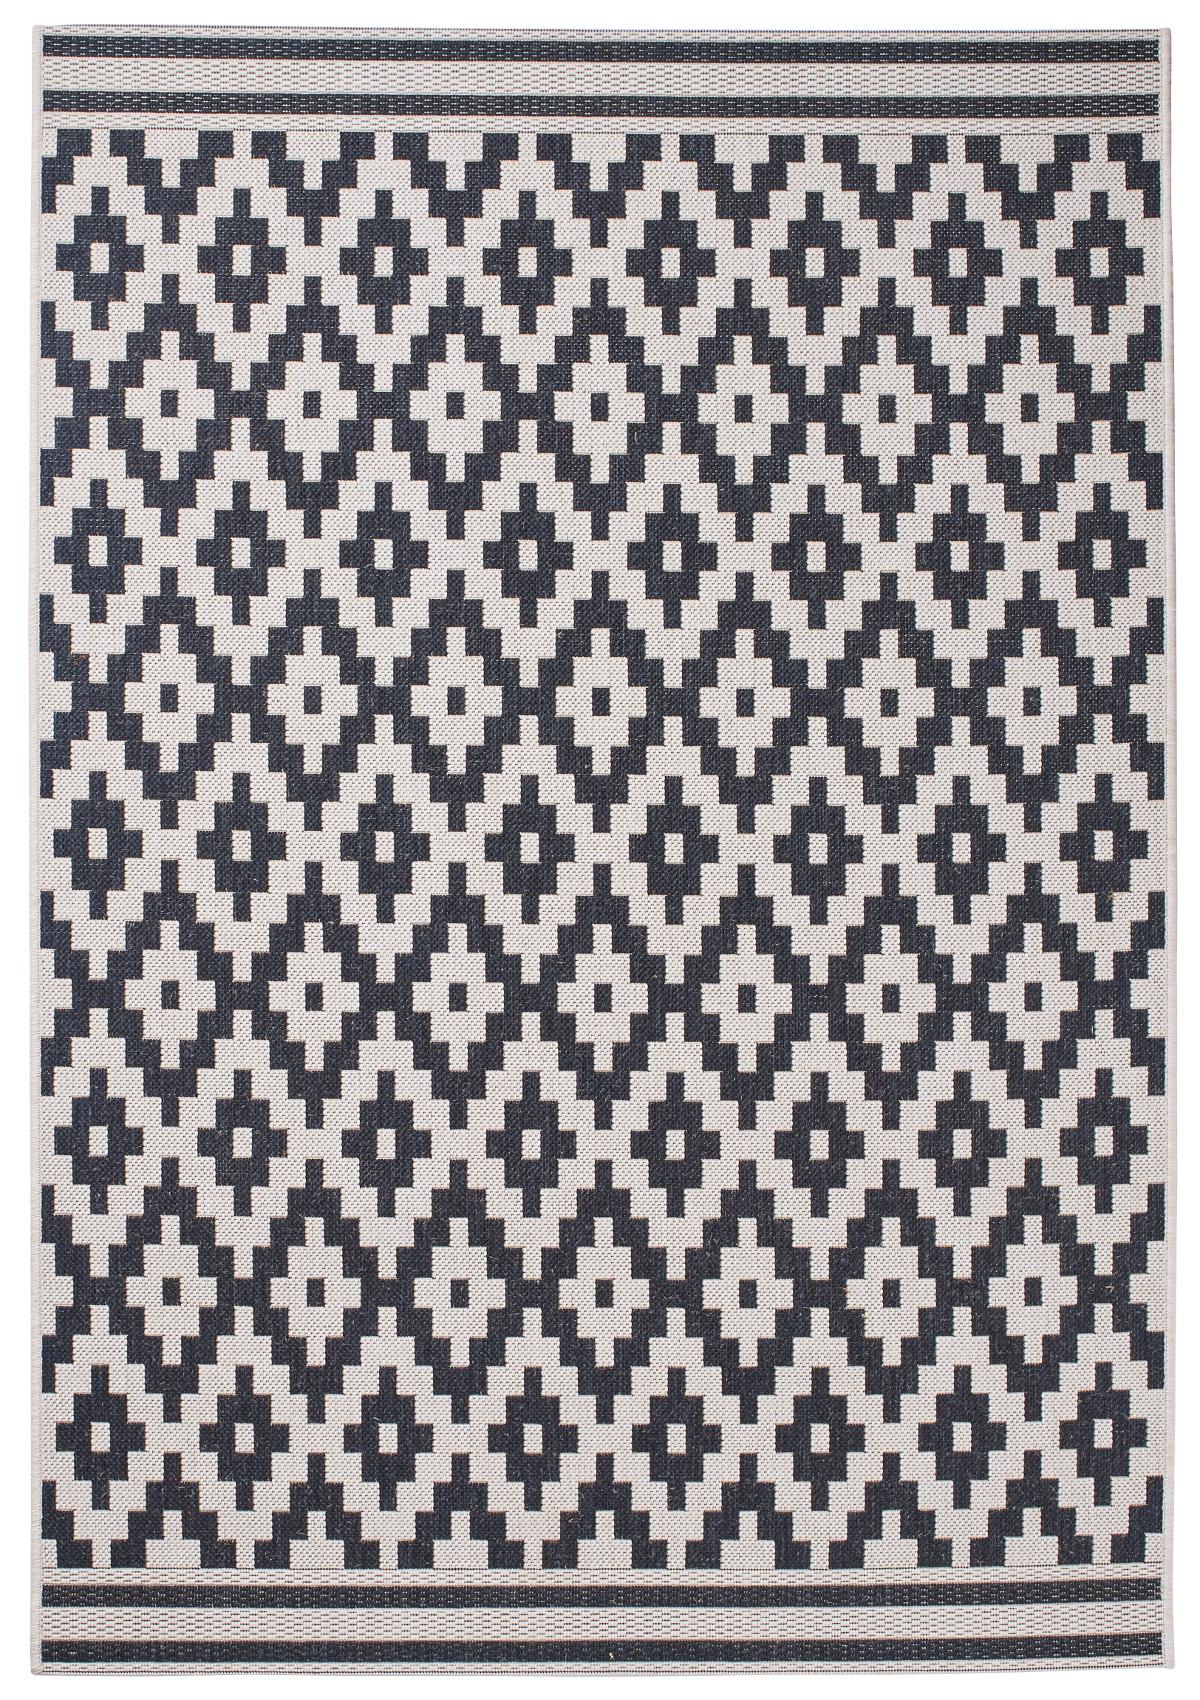 Wool Amp Black Diamond Pattern Rug Machine Made